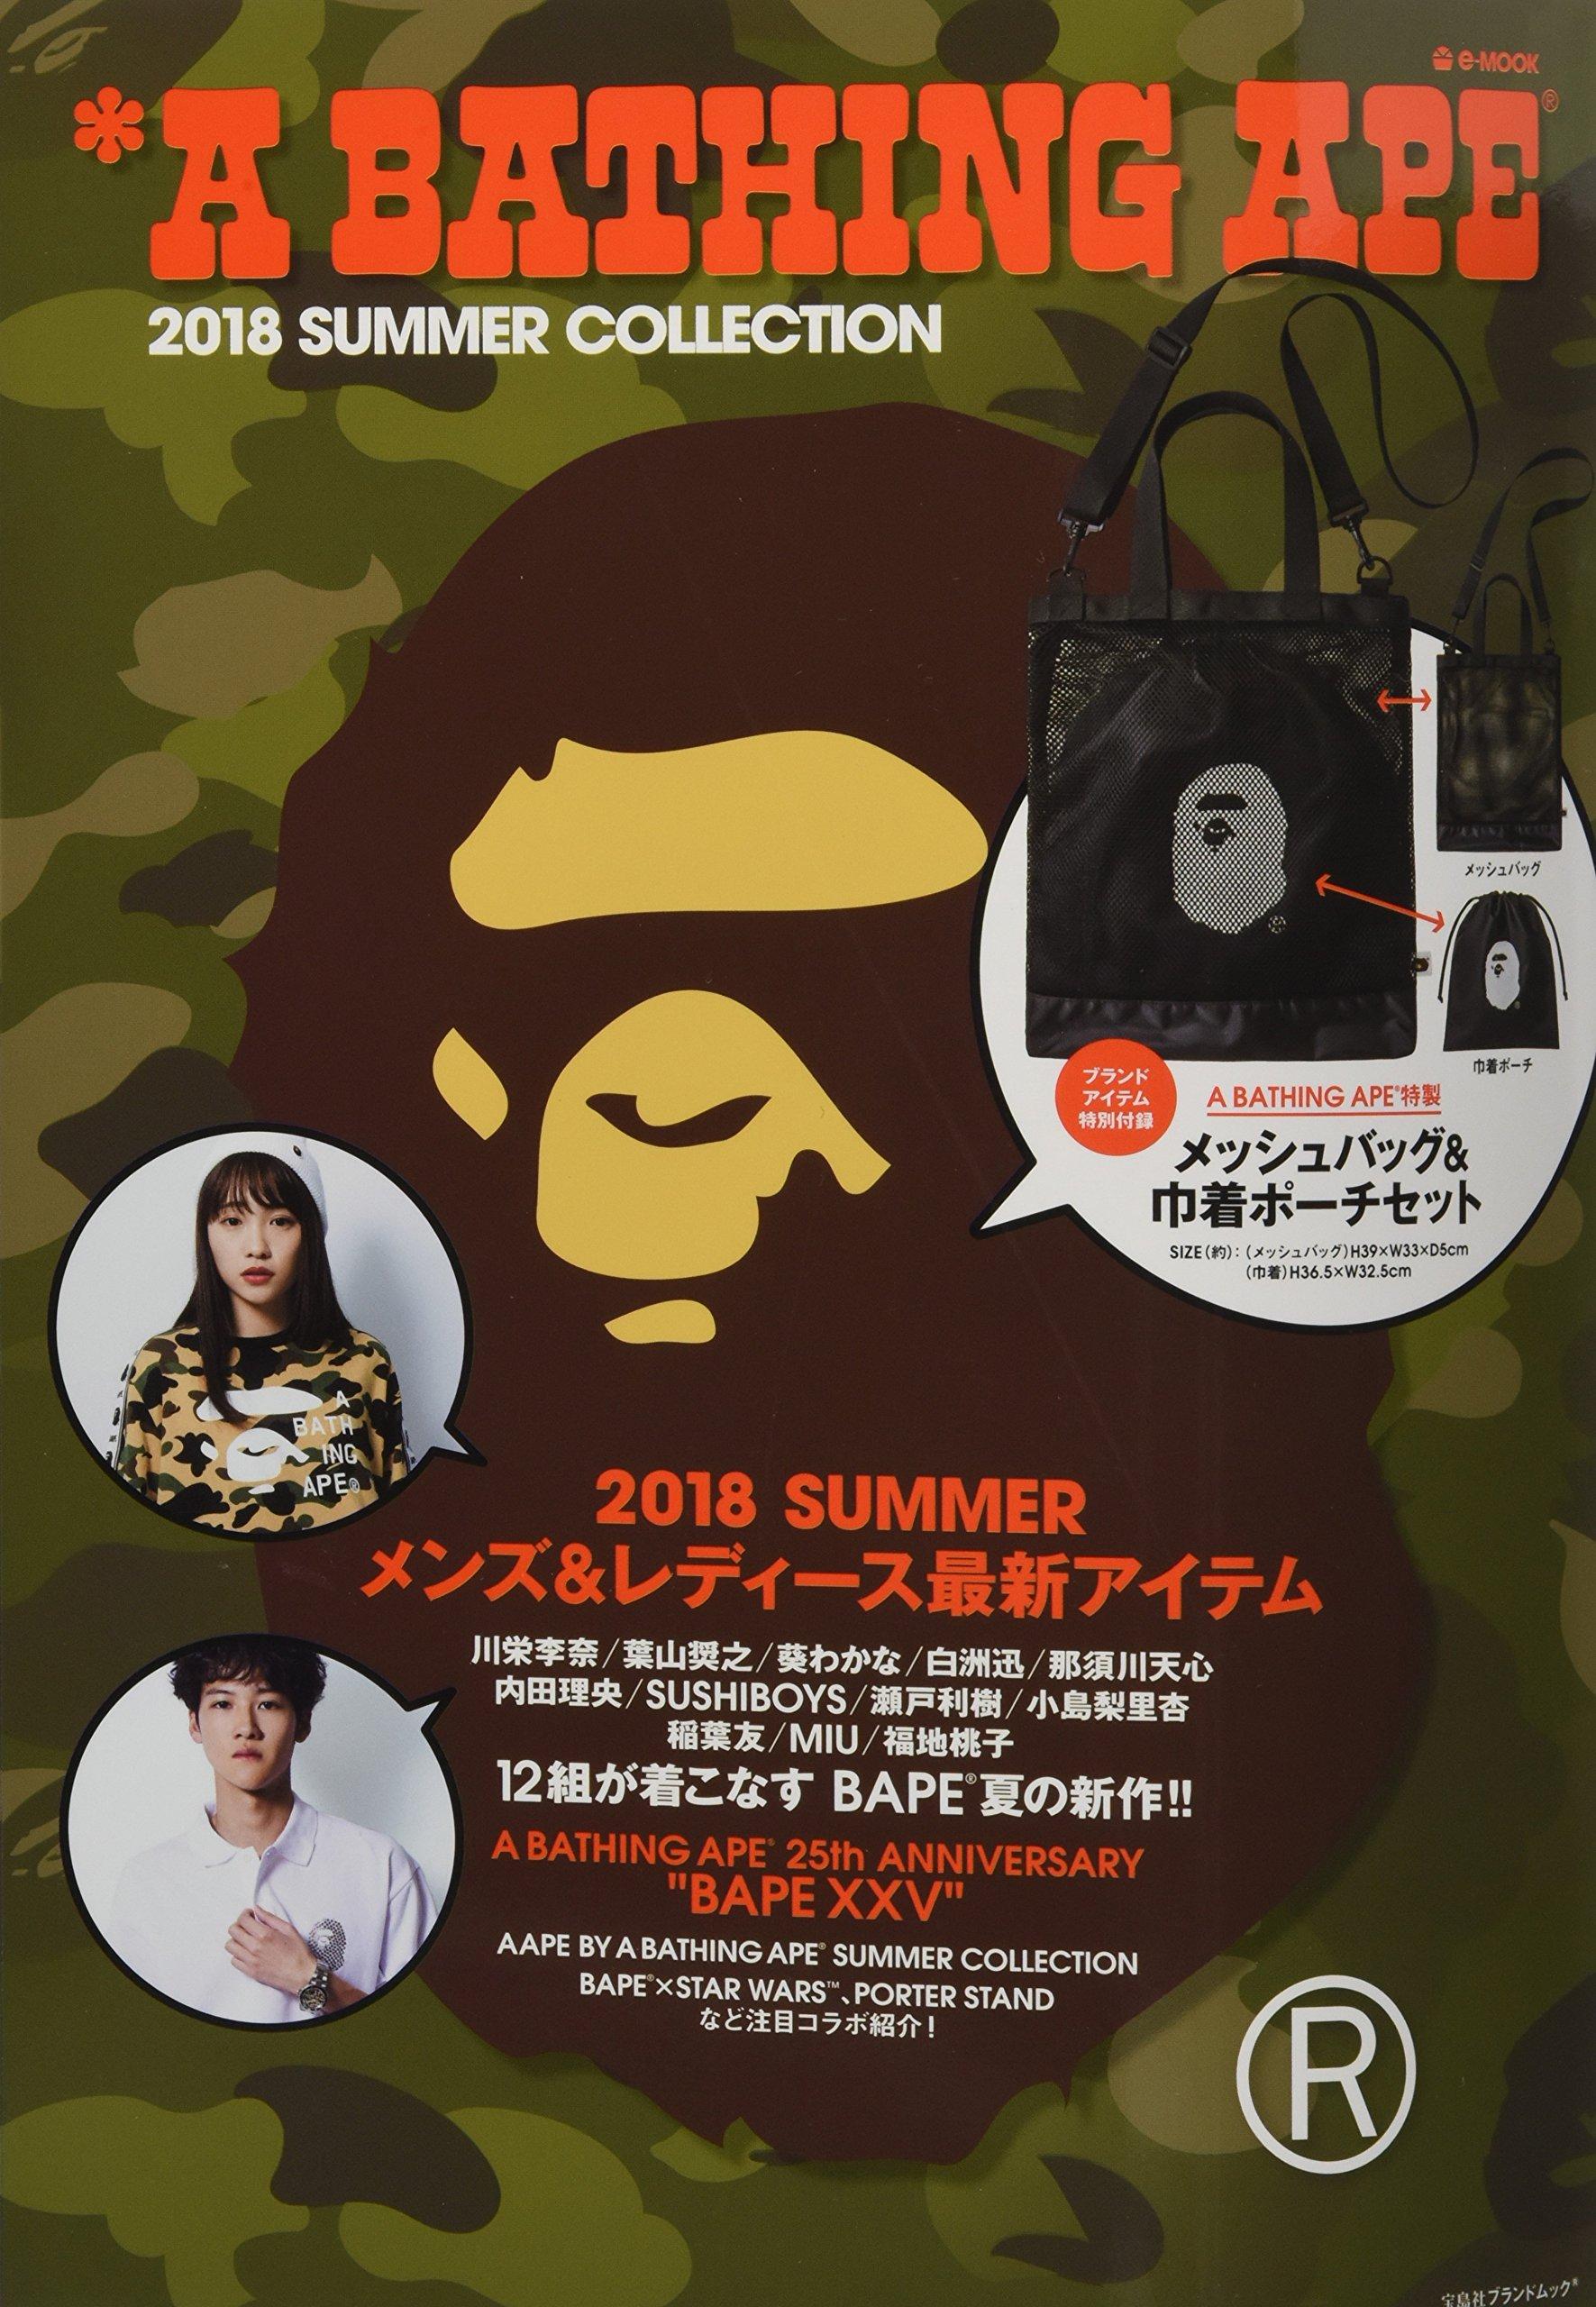 A BATHING APE MOOK BOOK 2019 SUMMER COLLECTION e-MOOK MAGAZINE w// Bag New